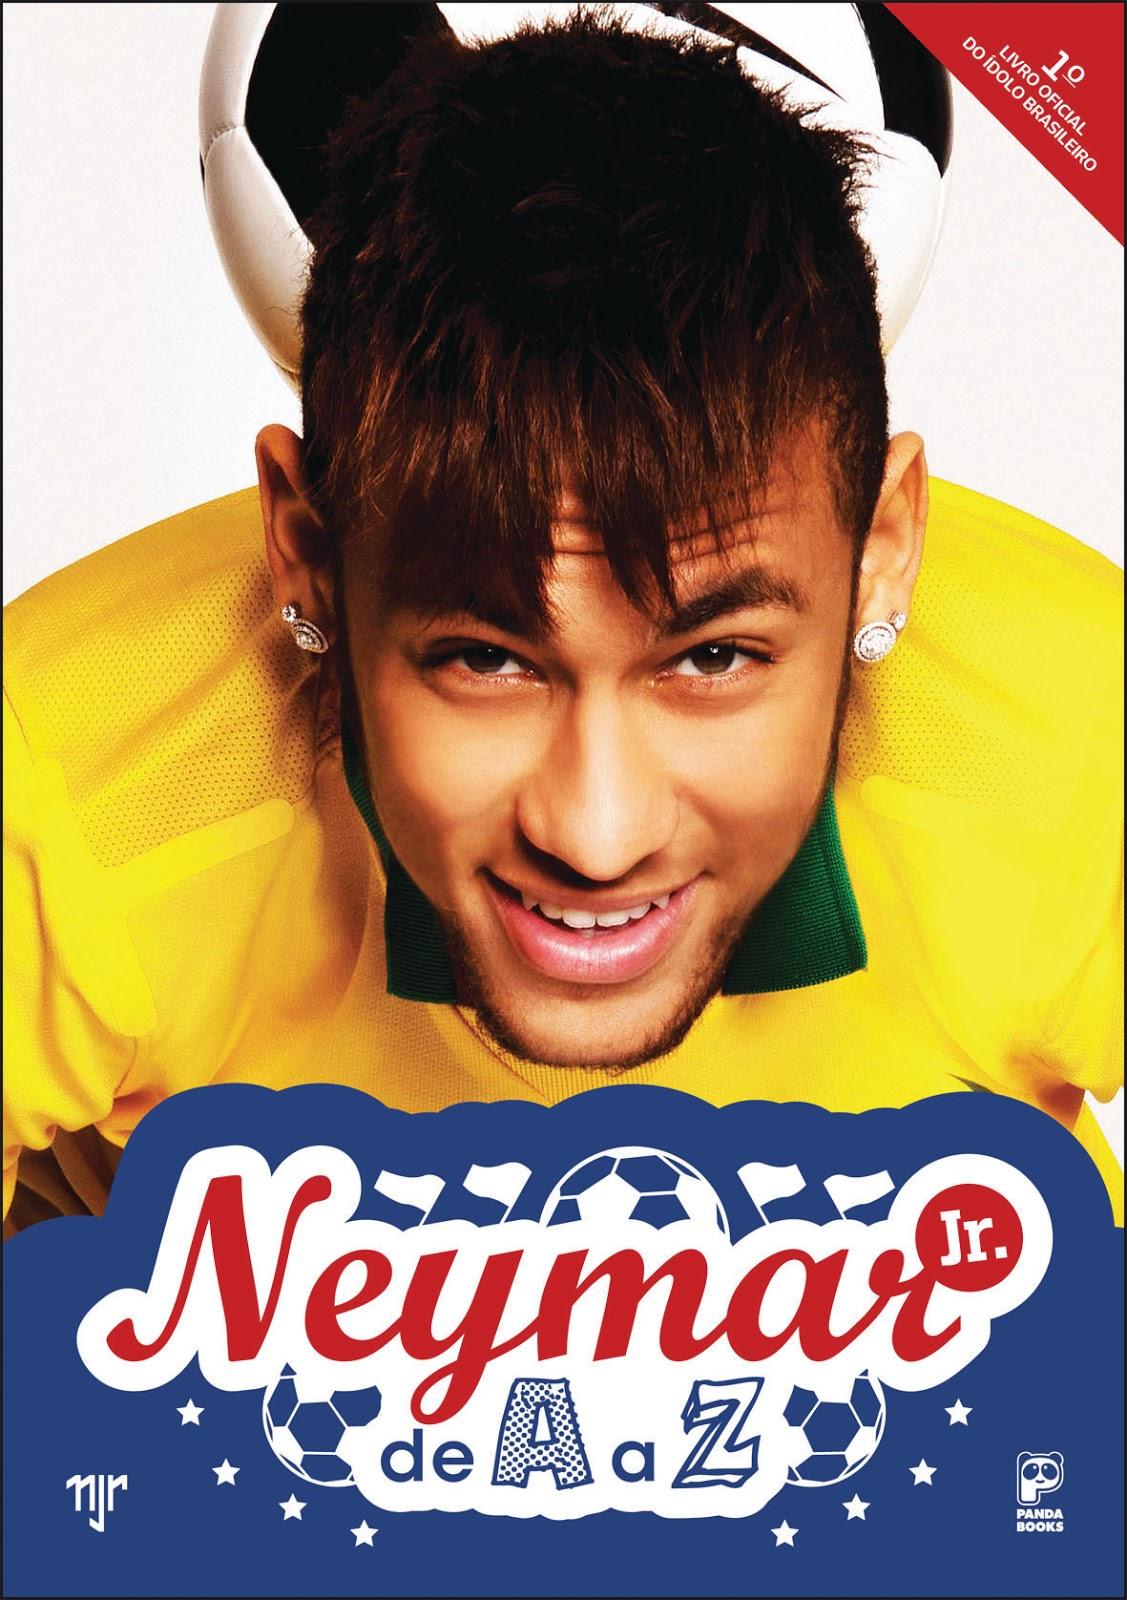 Literatura na Arquibancada  Neymar de A a Z da2ba891a9a00